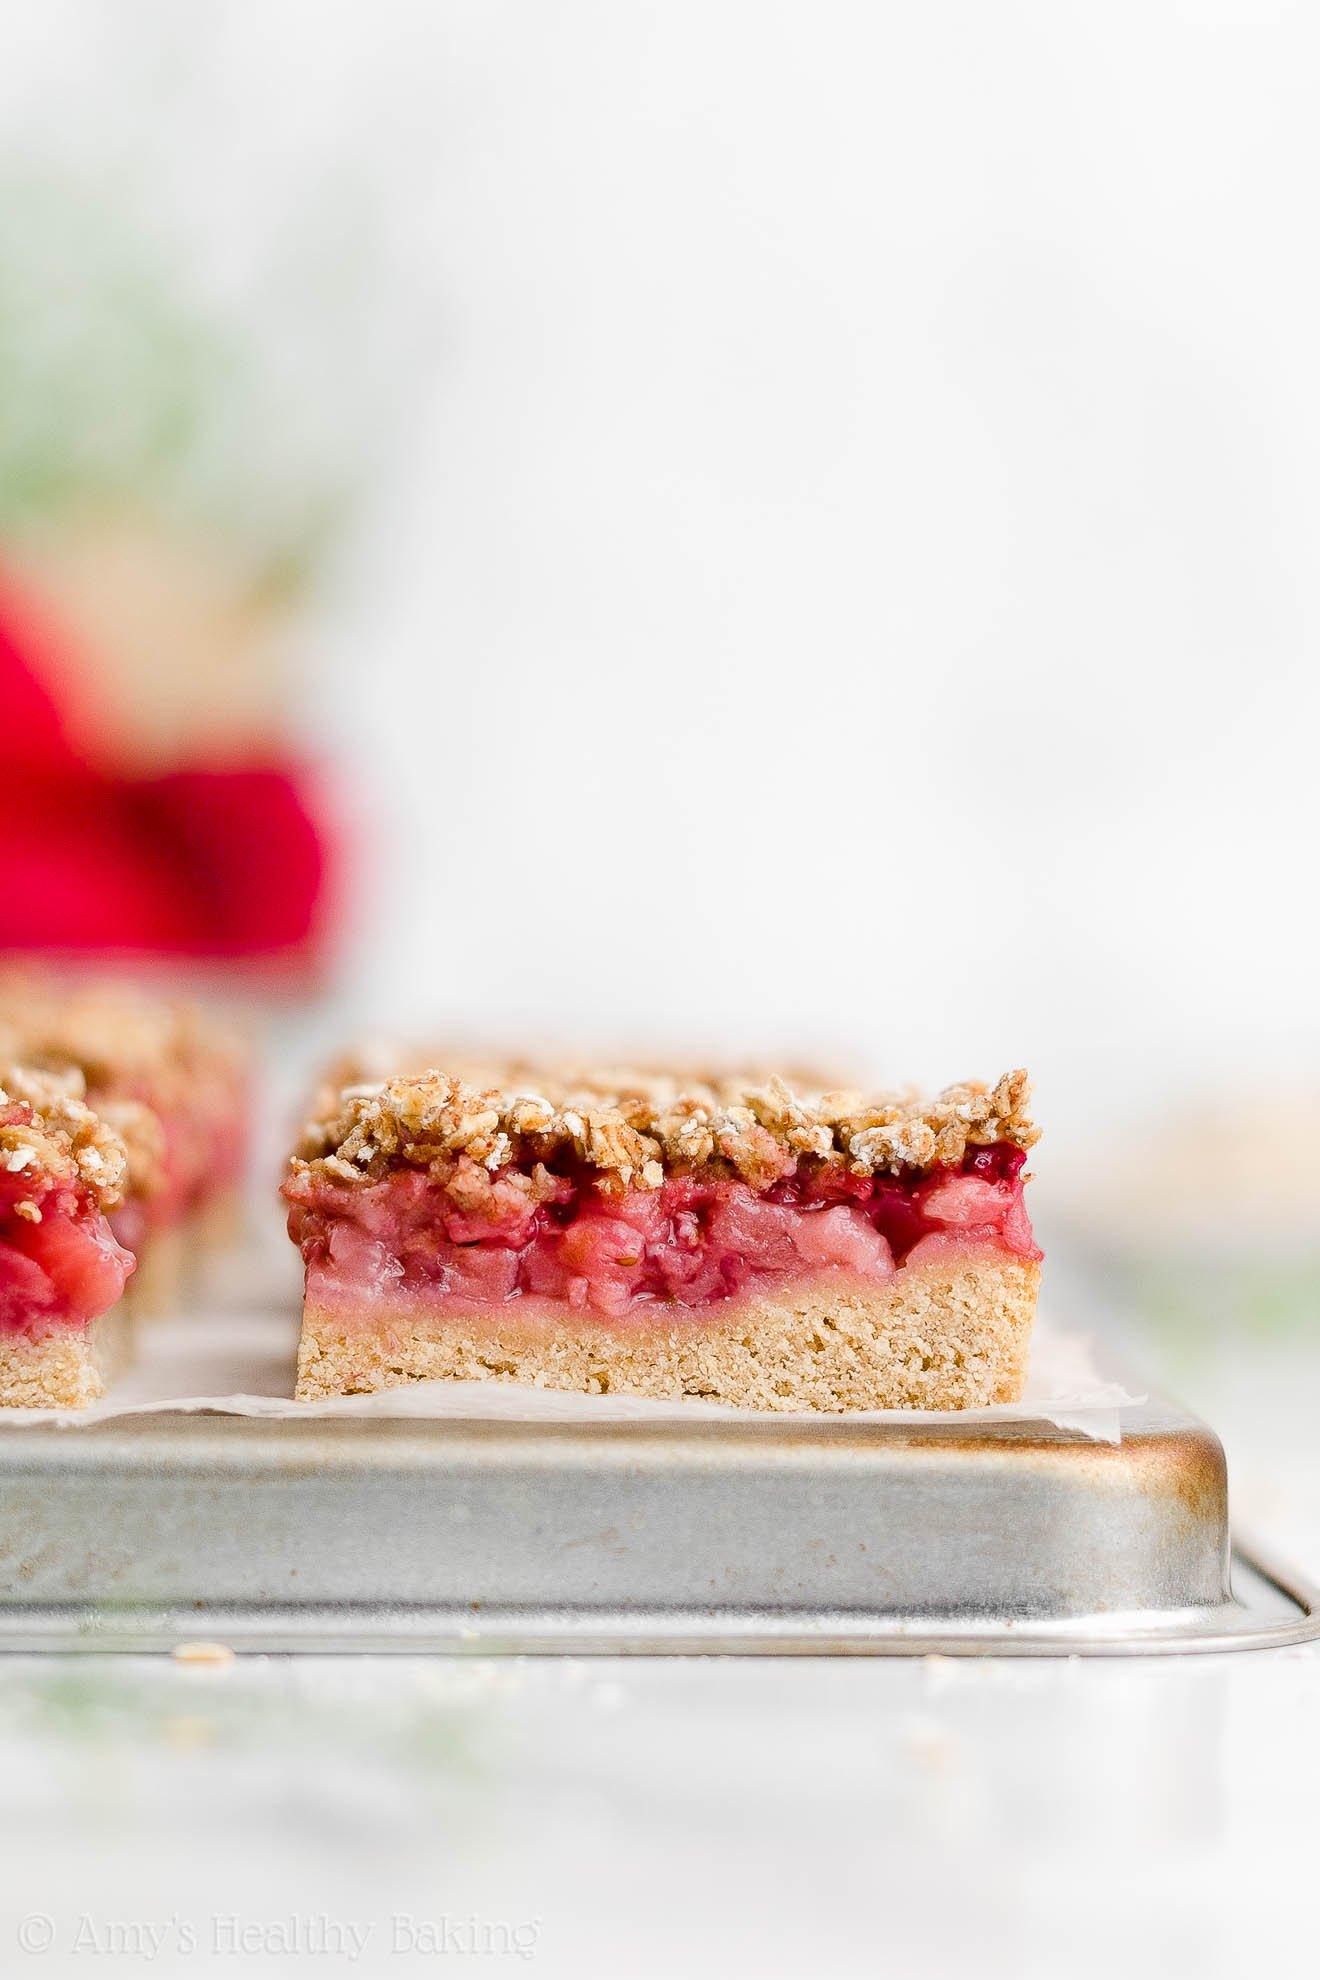 Healthy Strawberry Crumble Bars {Eggless & Dairy-Free!}